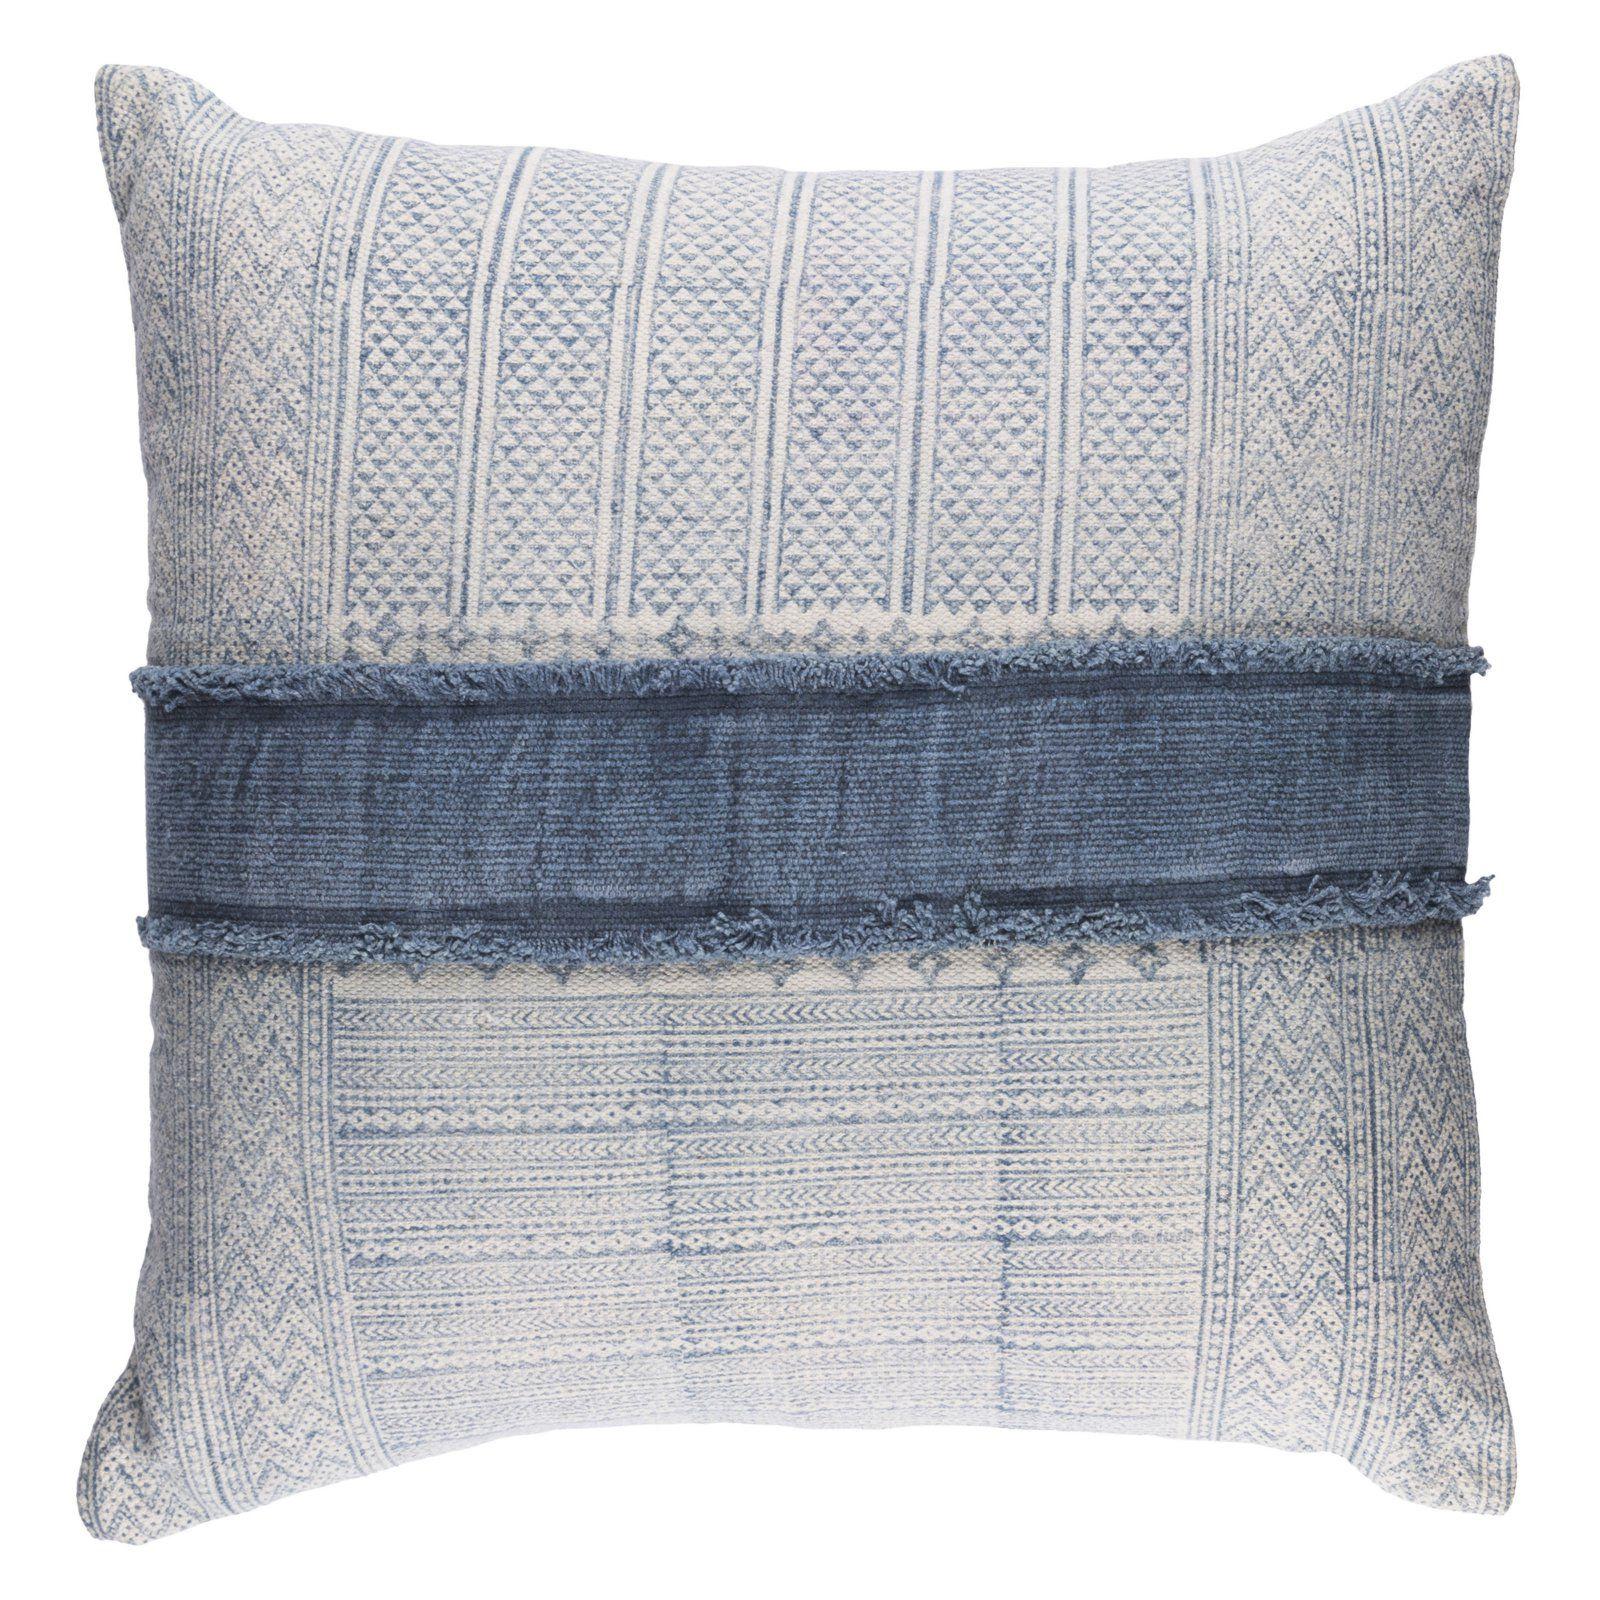 Surya Lola Square Decorative Throw Pillow Poly Large Throw Pillows Throw Pillows Decorative Throw Pillows